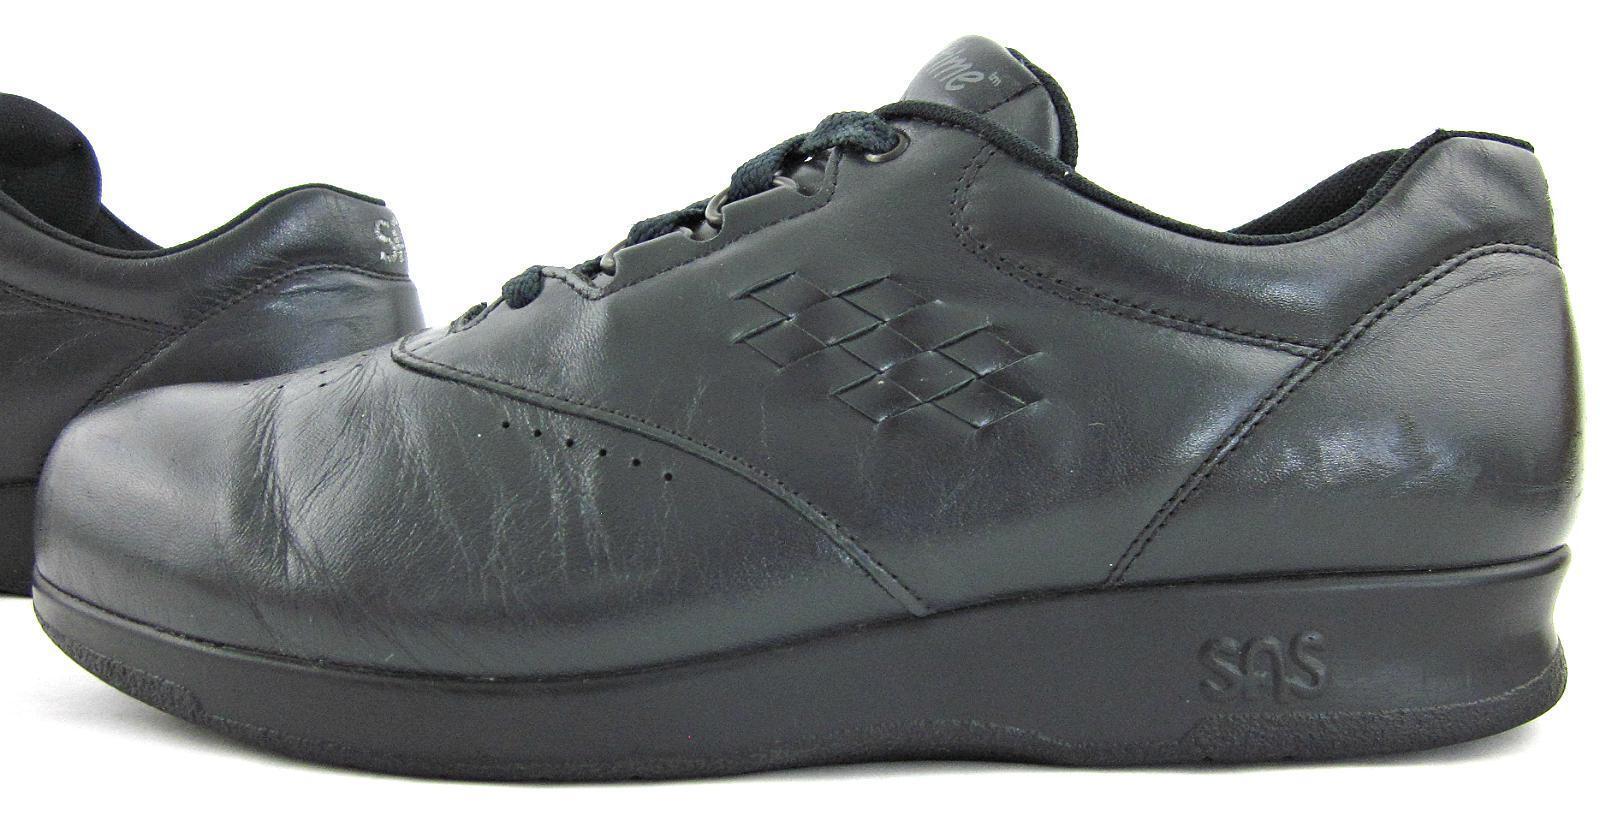 SAS 'Free Time' Damenschuhe Lace Up Walking Schuhes Navy Blau Sz 8.5N Narrow